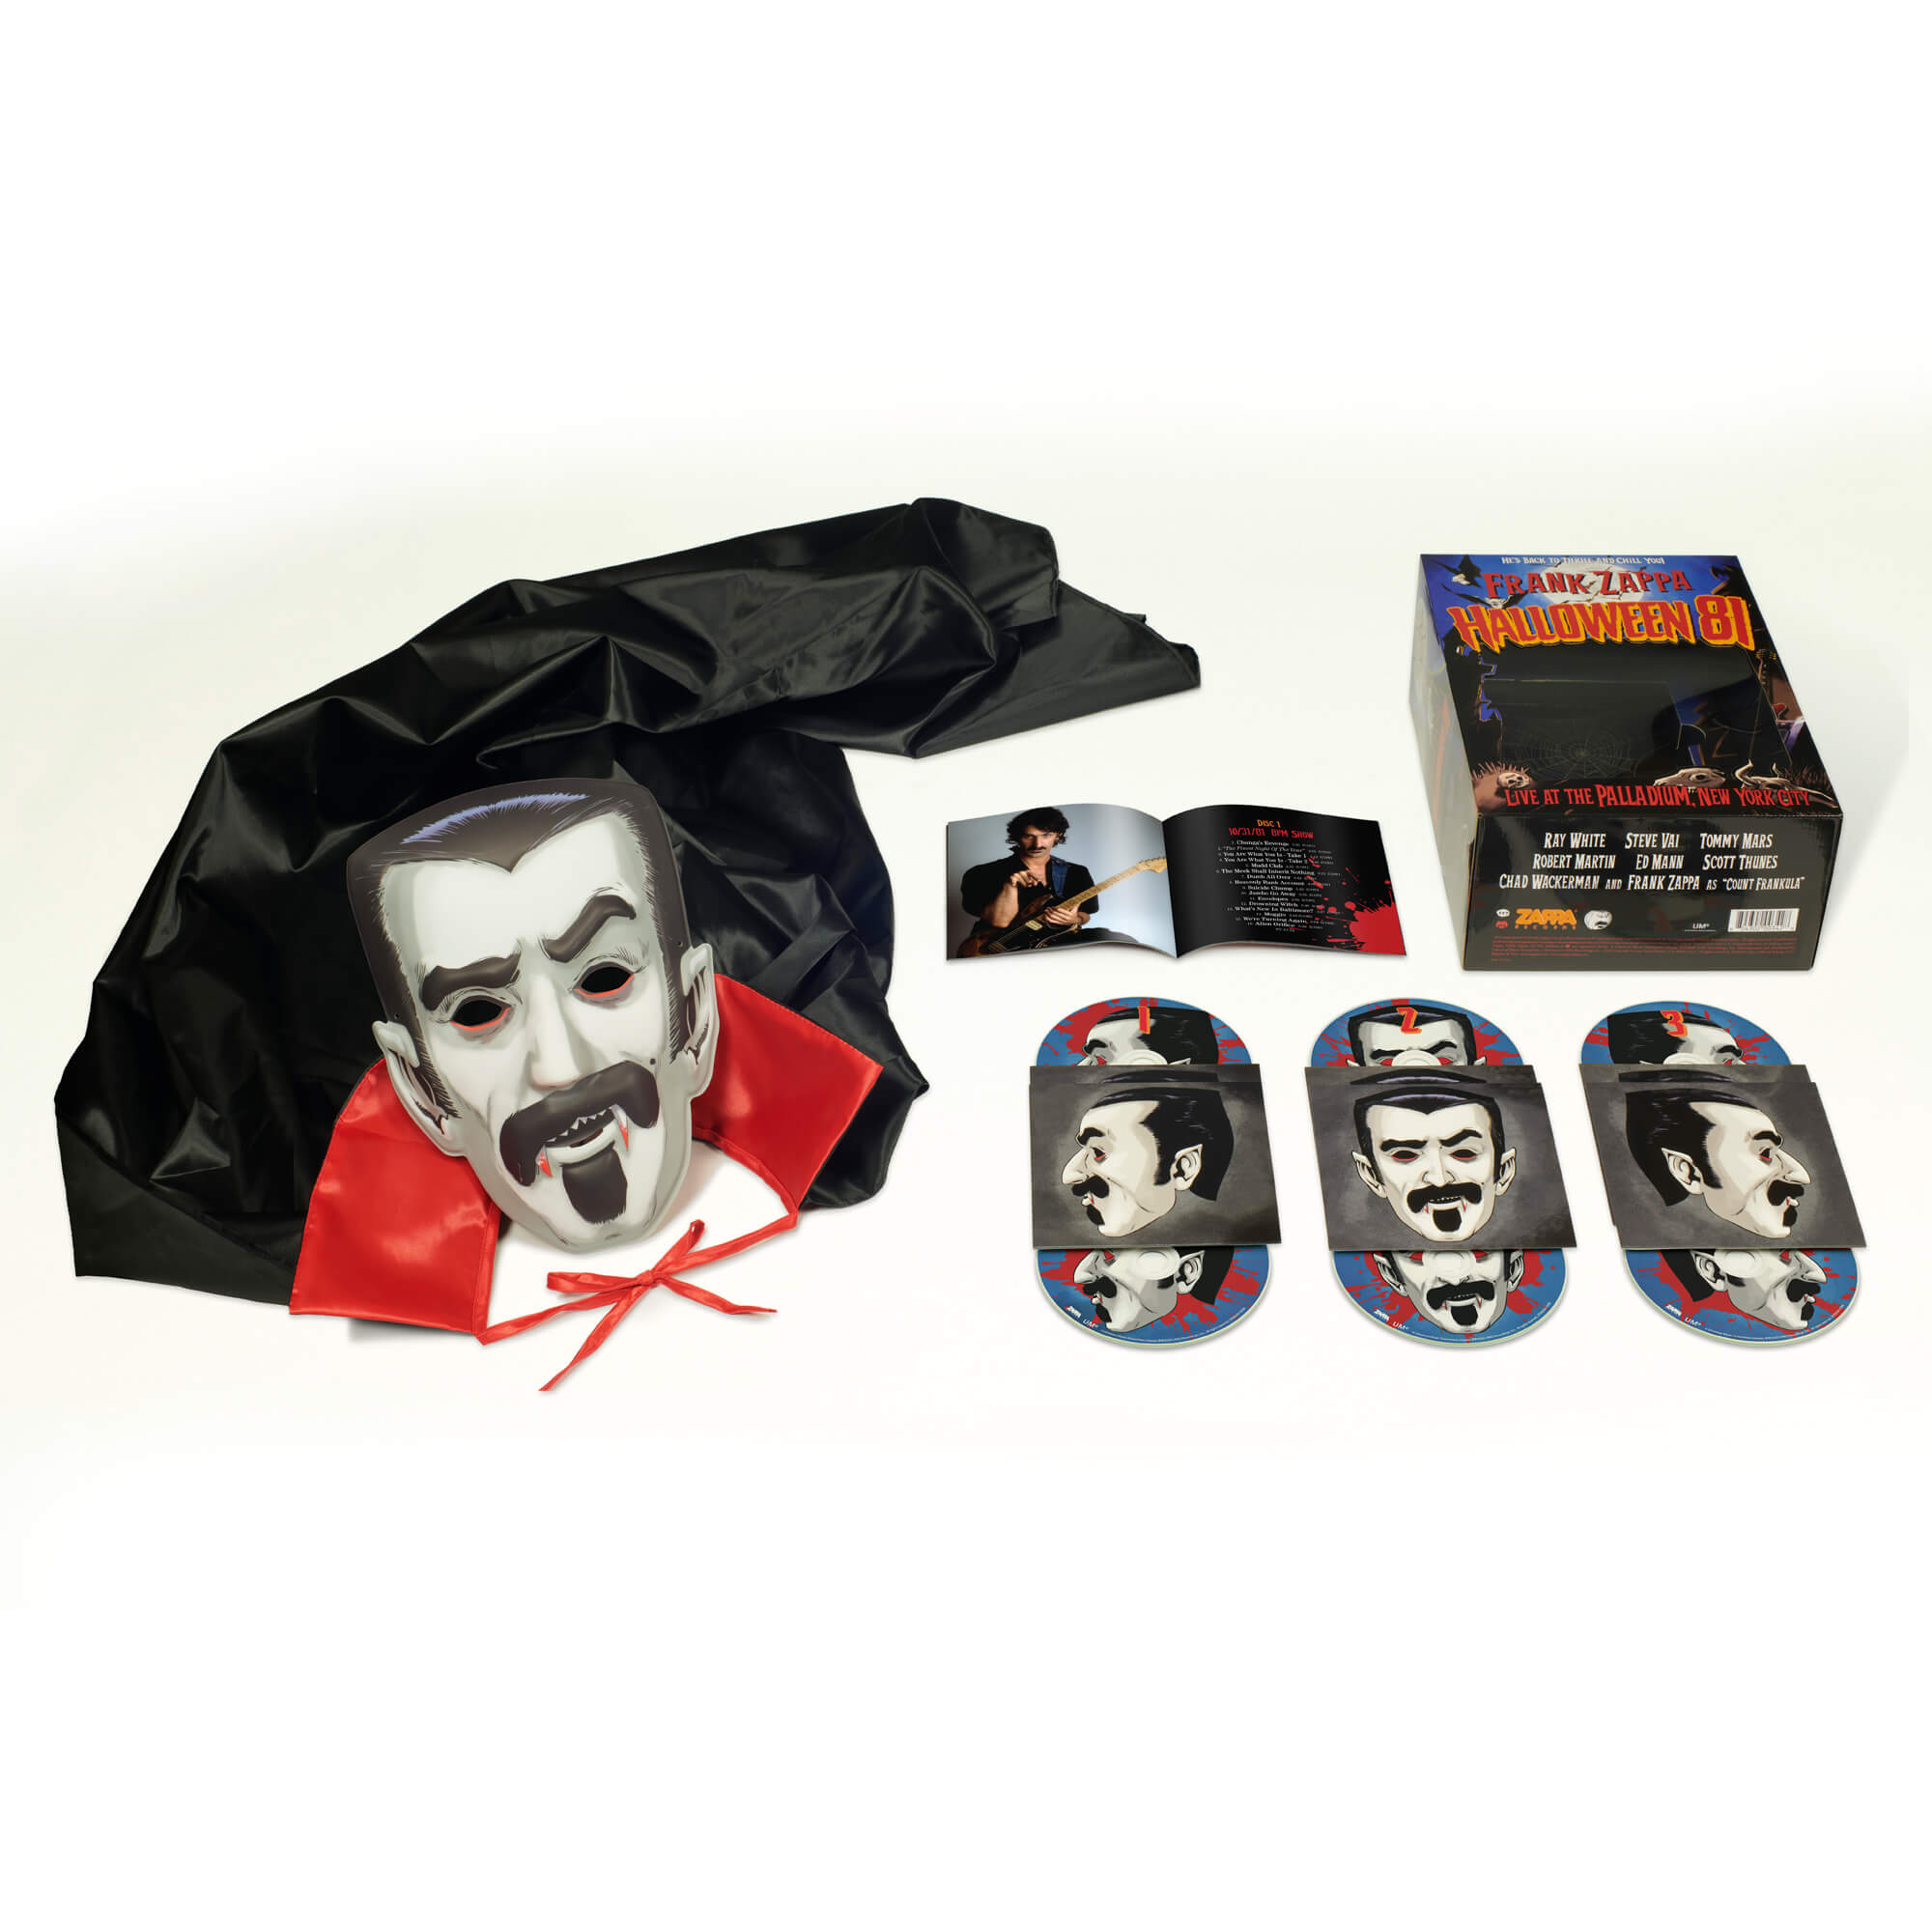 Frank Zappa – Halloween 81: 6CD Box Set